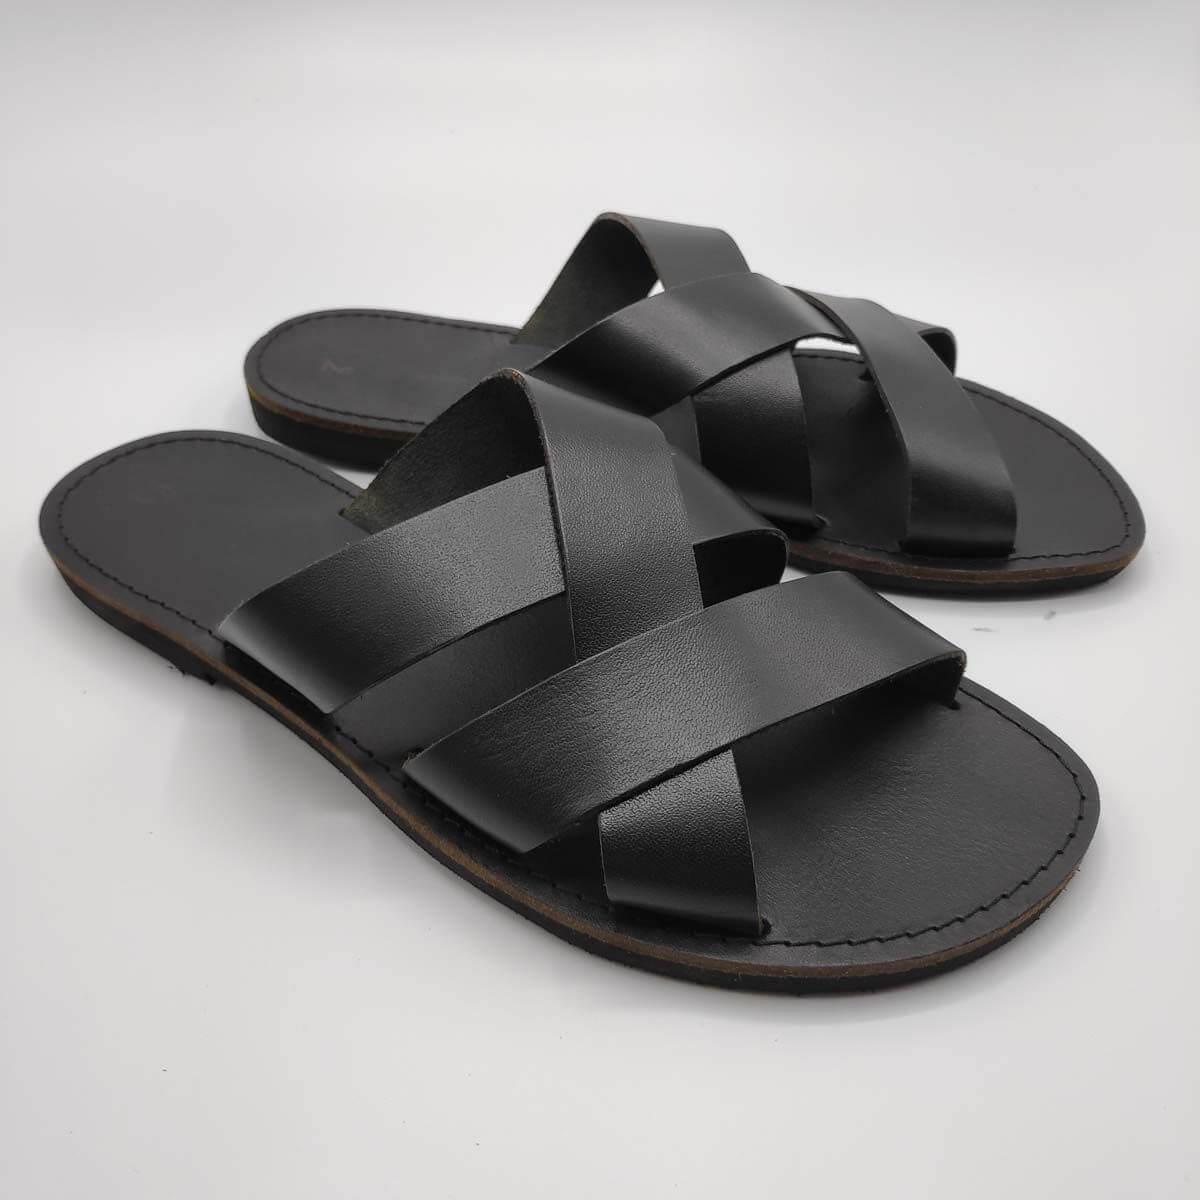 leather sandals for men black three straps criss cross side view - Avithos Men